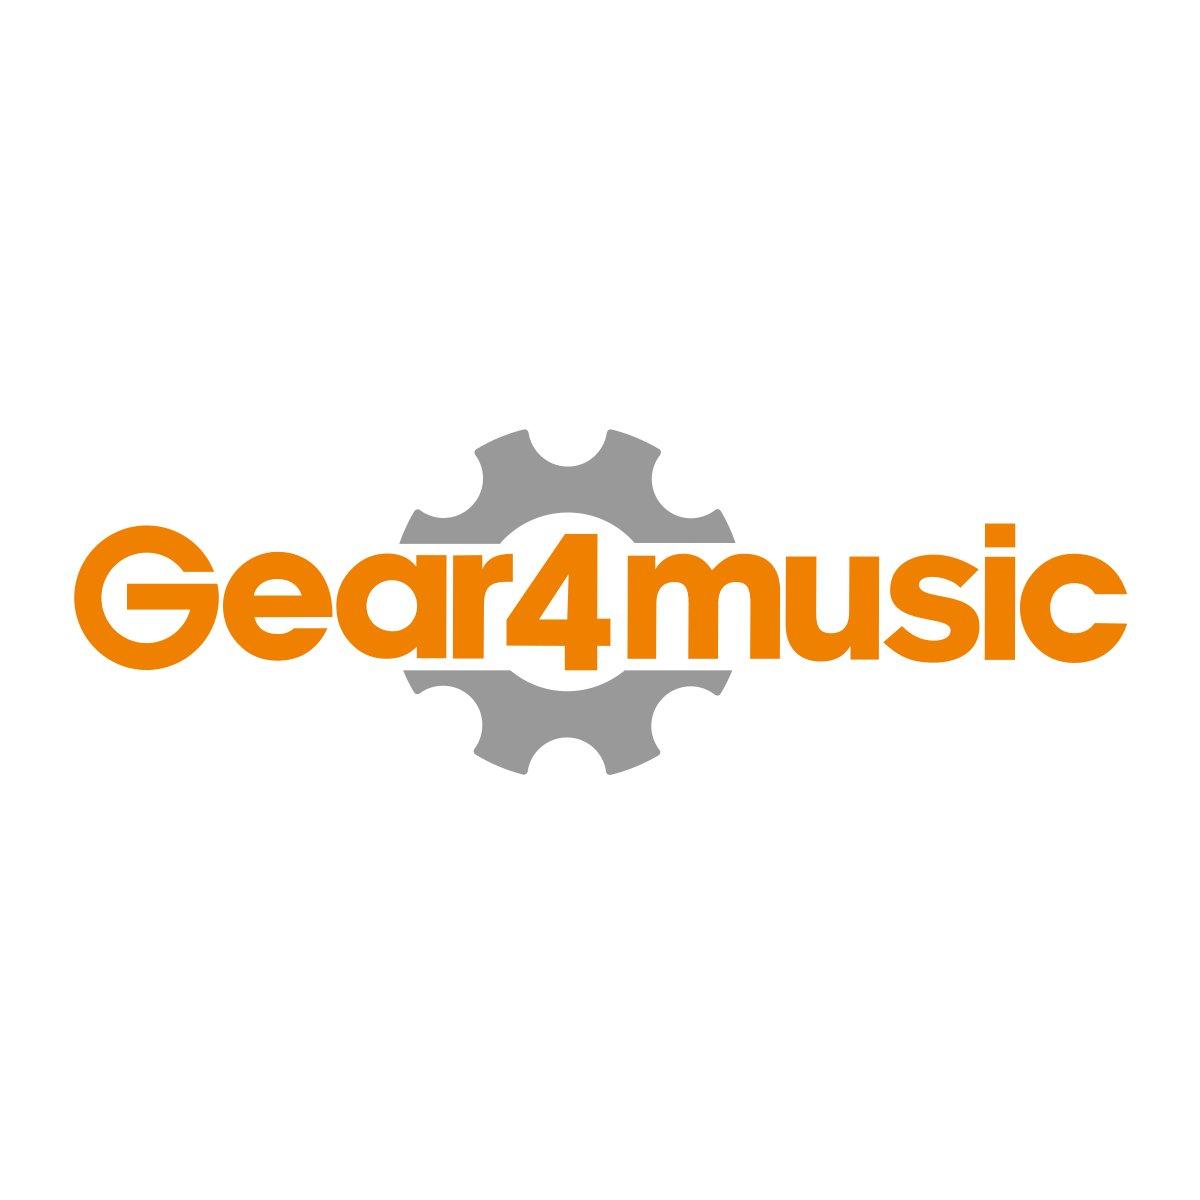 MK-2000 54-key Portable Keyboard by Gear4music  + Accessory Pack